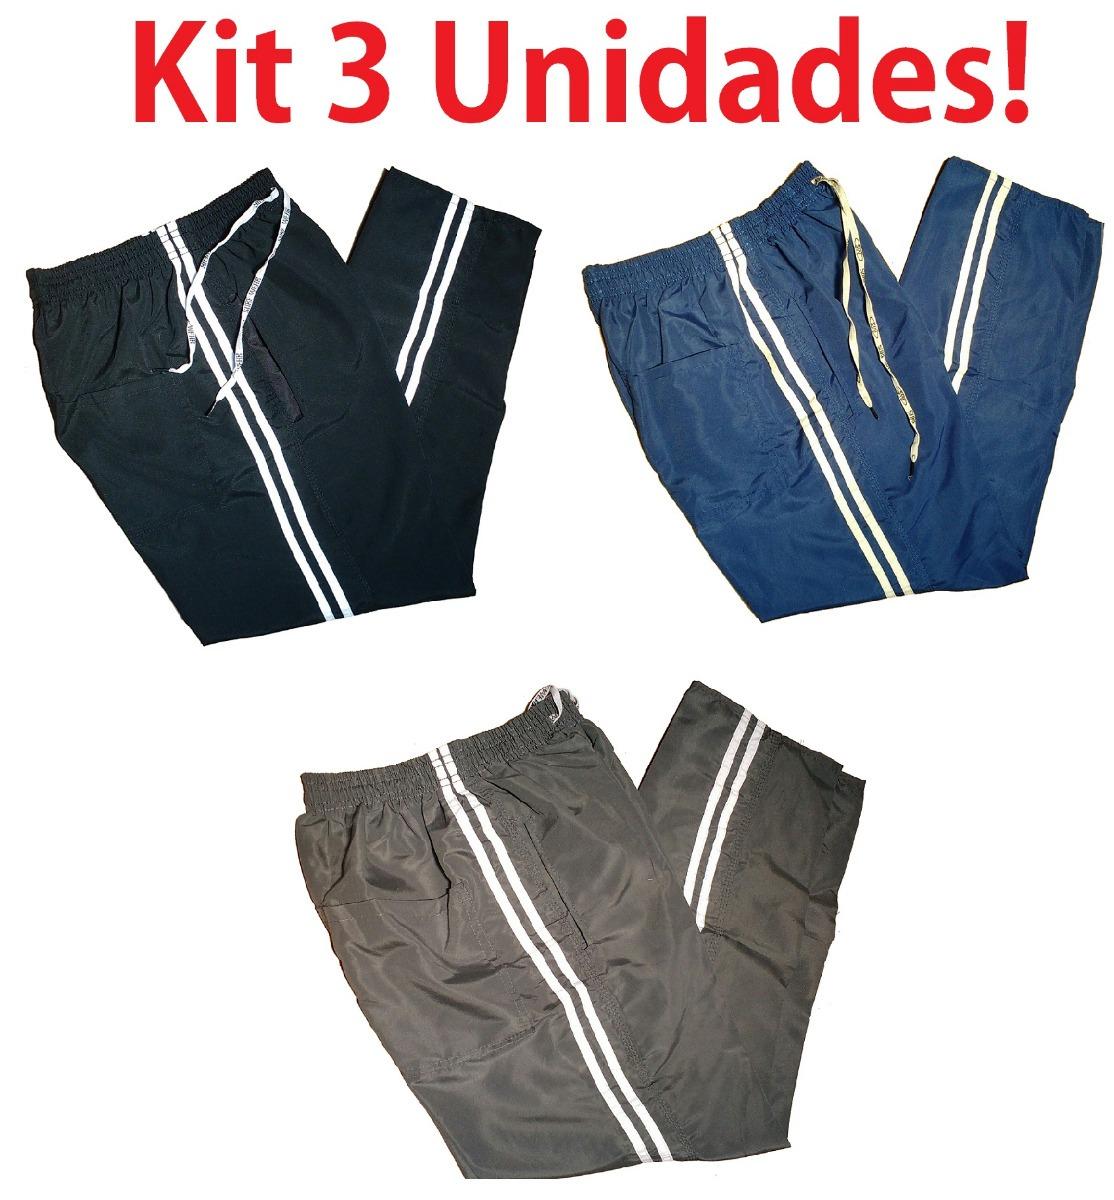 986d05fb0 kit 3 calça tactel 3 bolsos ajuste interno academia corrida. Carregando zoom .